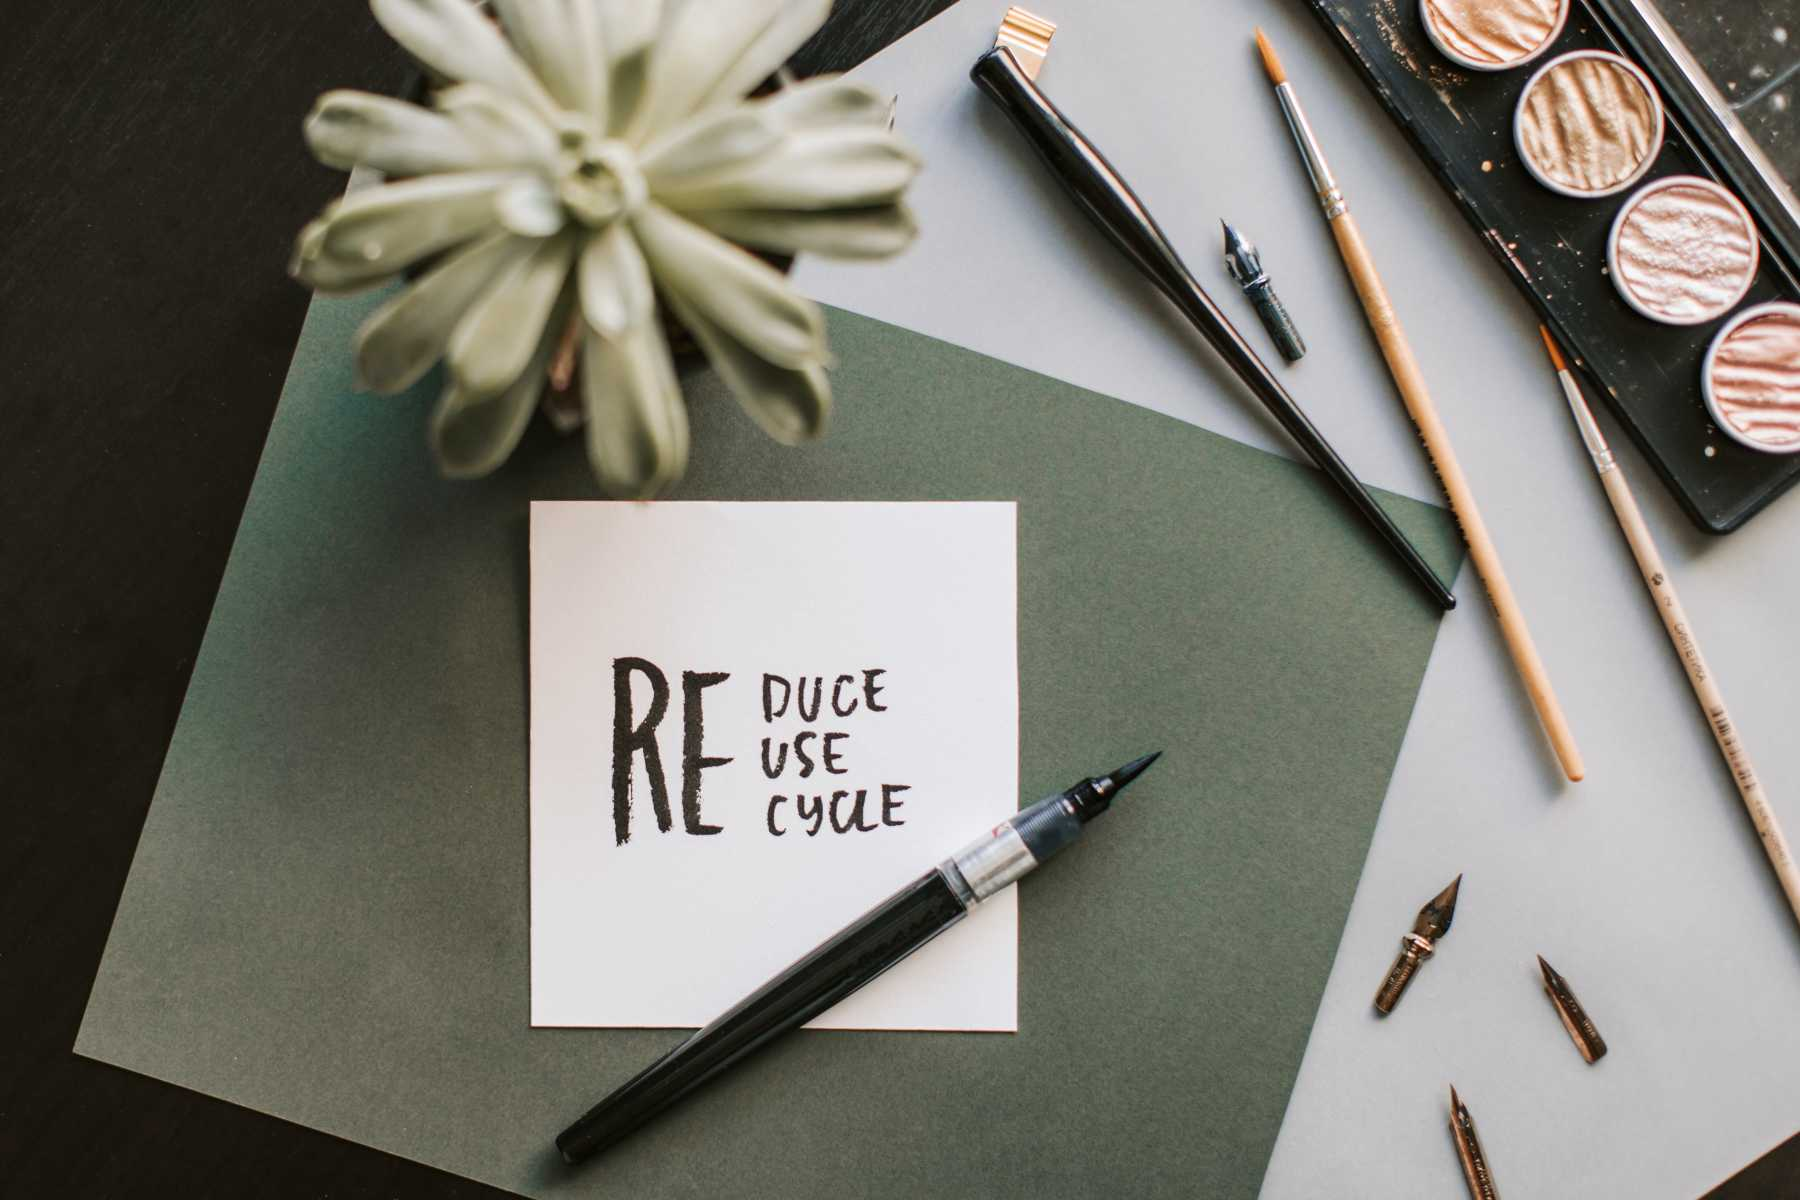 reduce reusa recicla trucos reciclaje experto alsa